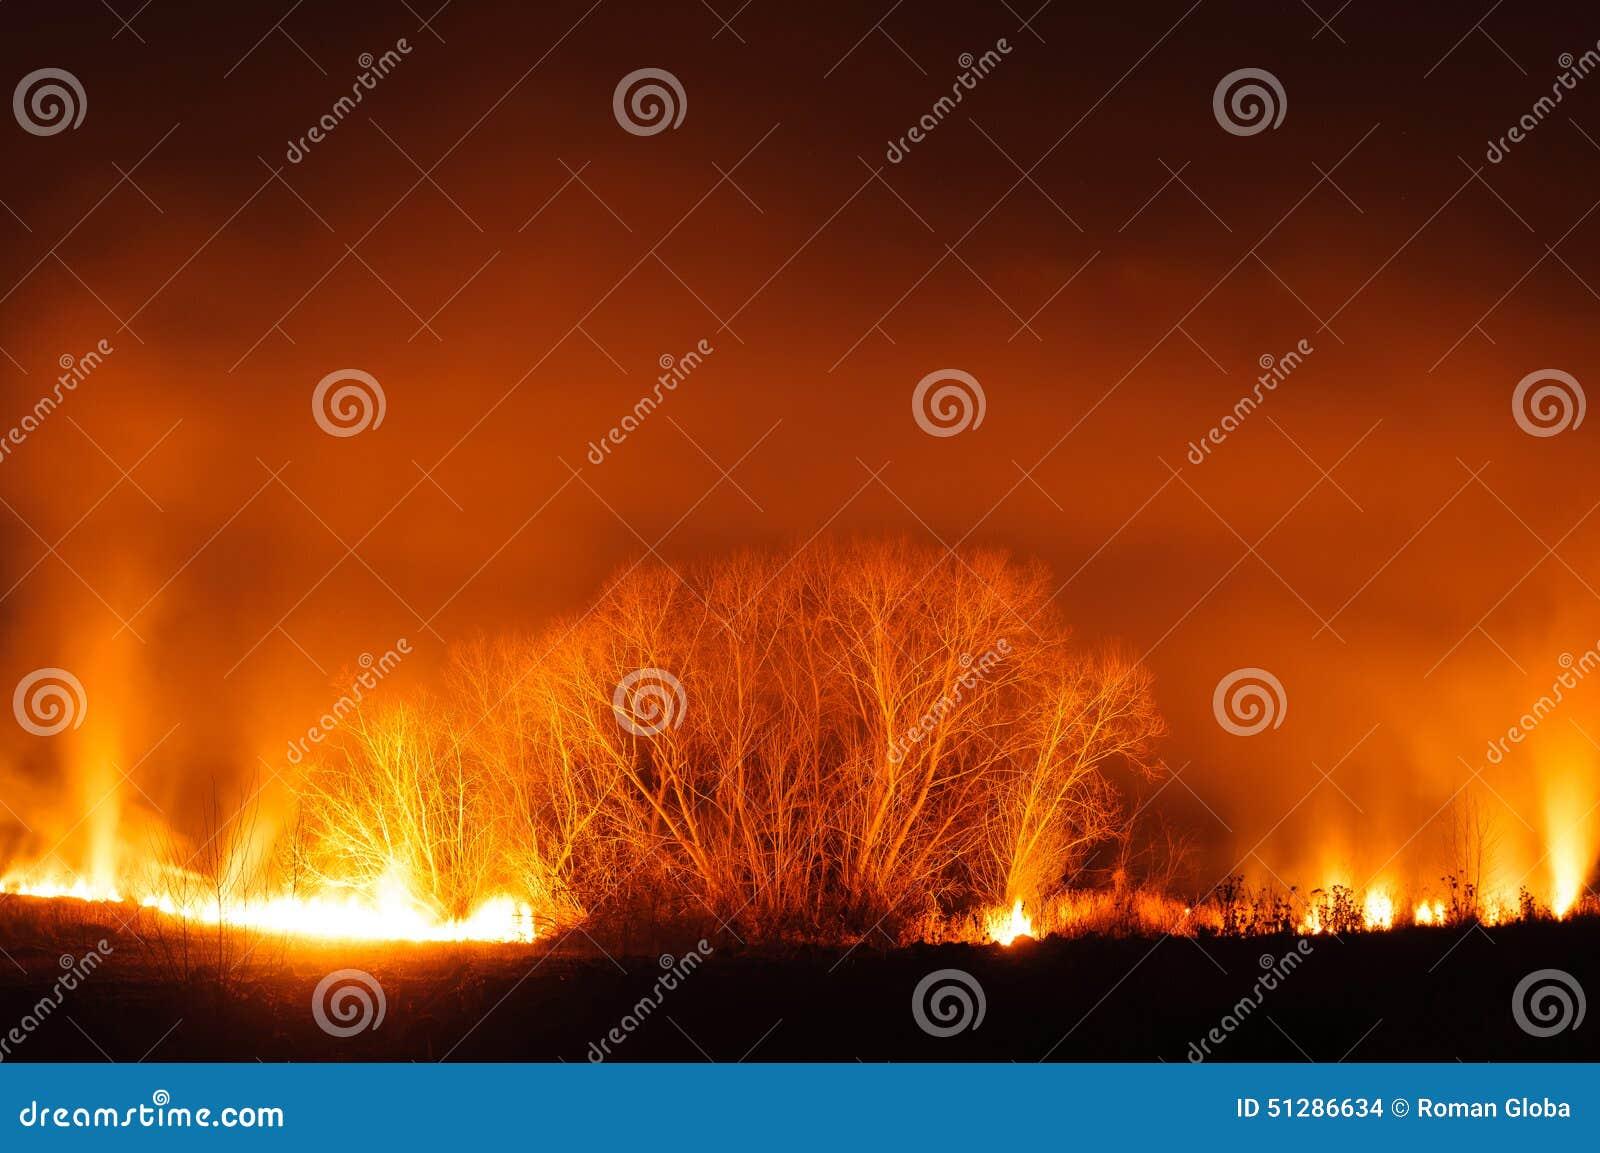 Feld auf Rotglühen des Feuers